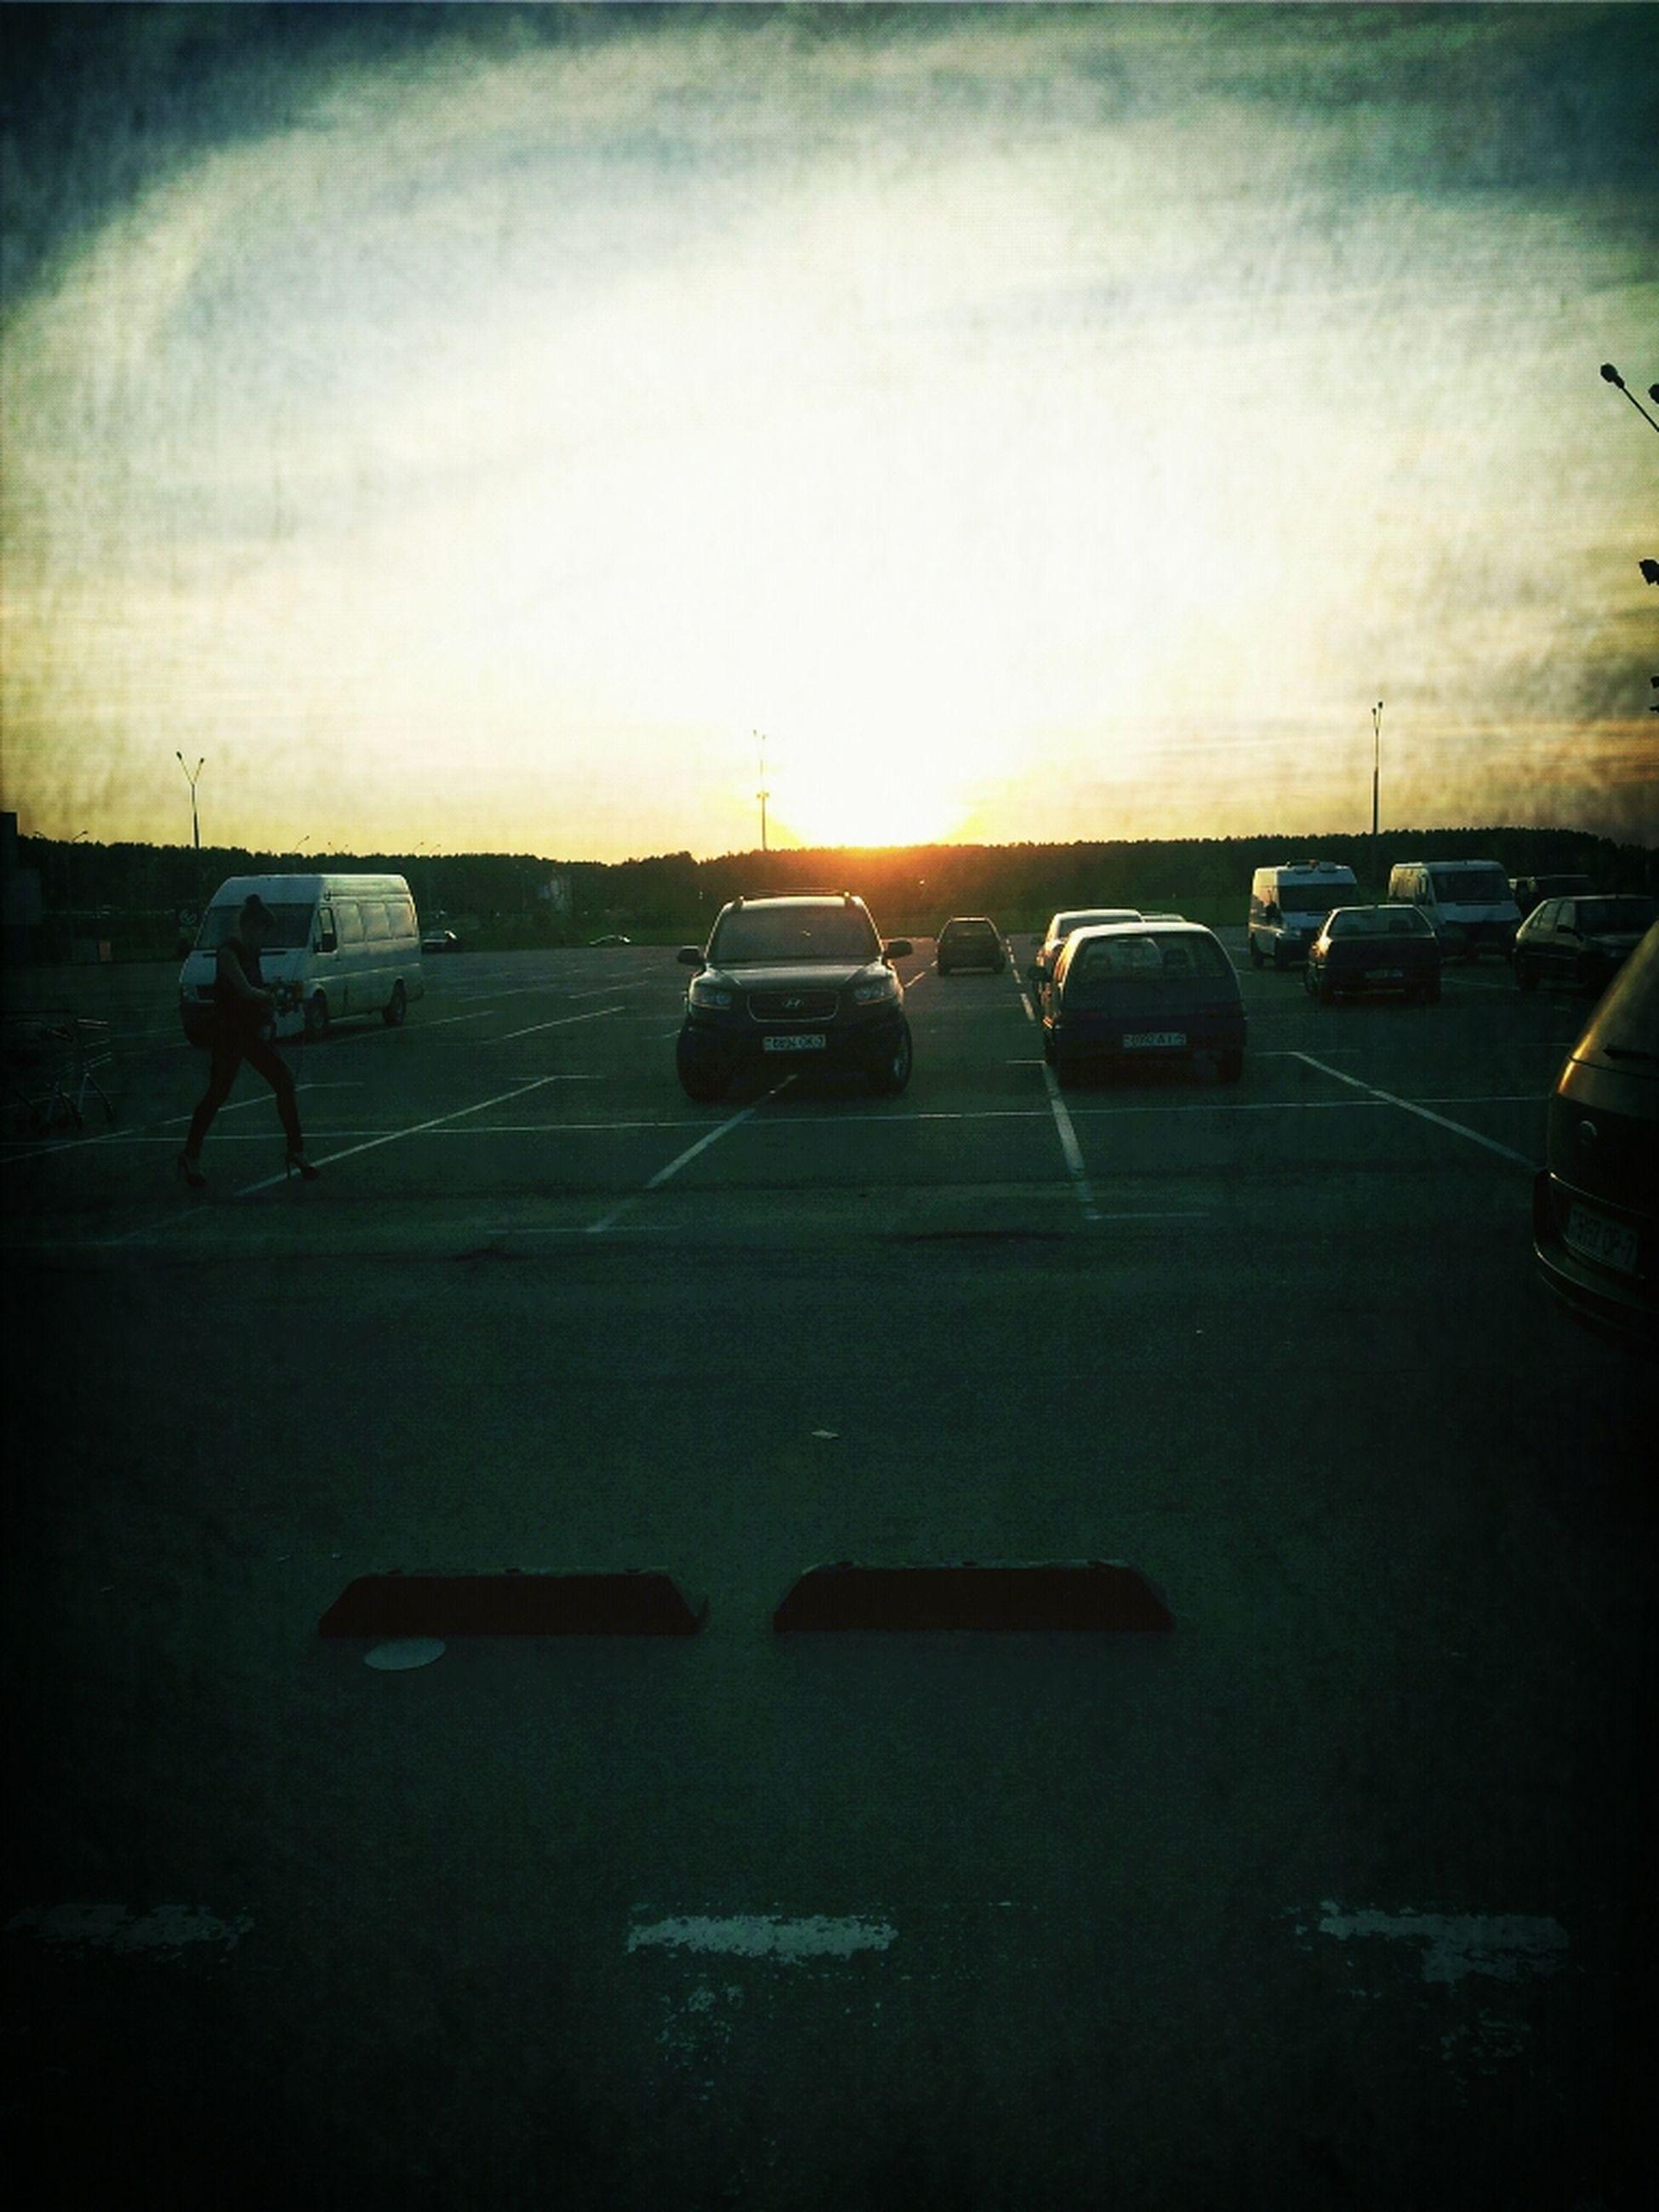 transportation, car, land vehicle, mode of transport, sunset, sky, road, street, silhouette, on the move, sunlight, cloud - sky, travel, sun, road marking, outdoors, cloud, sunbeam